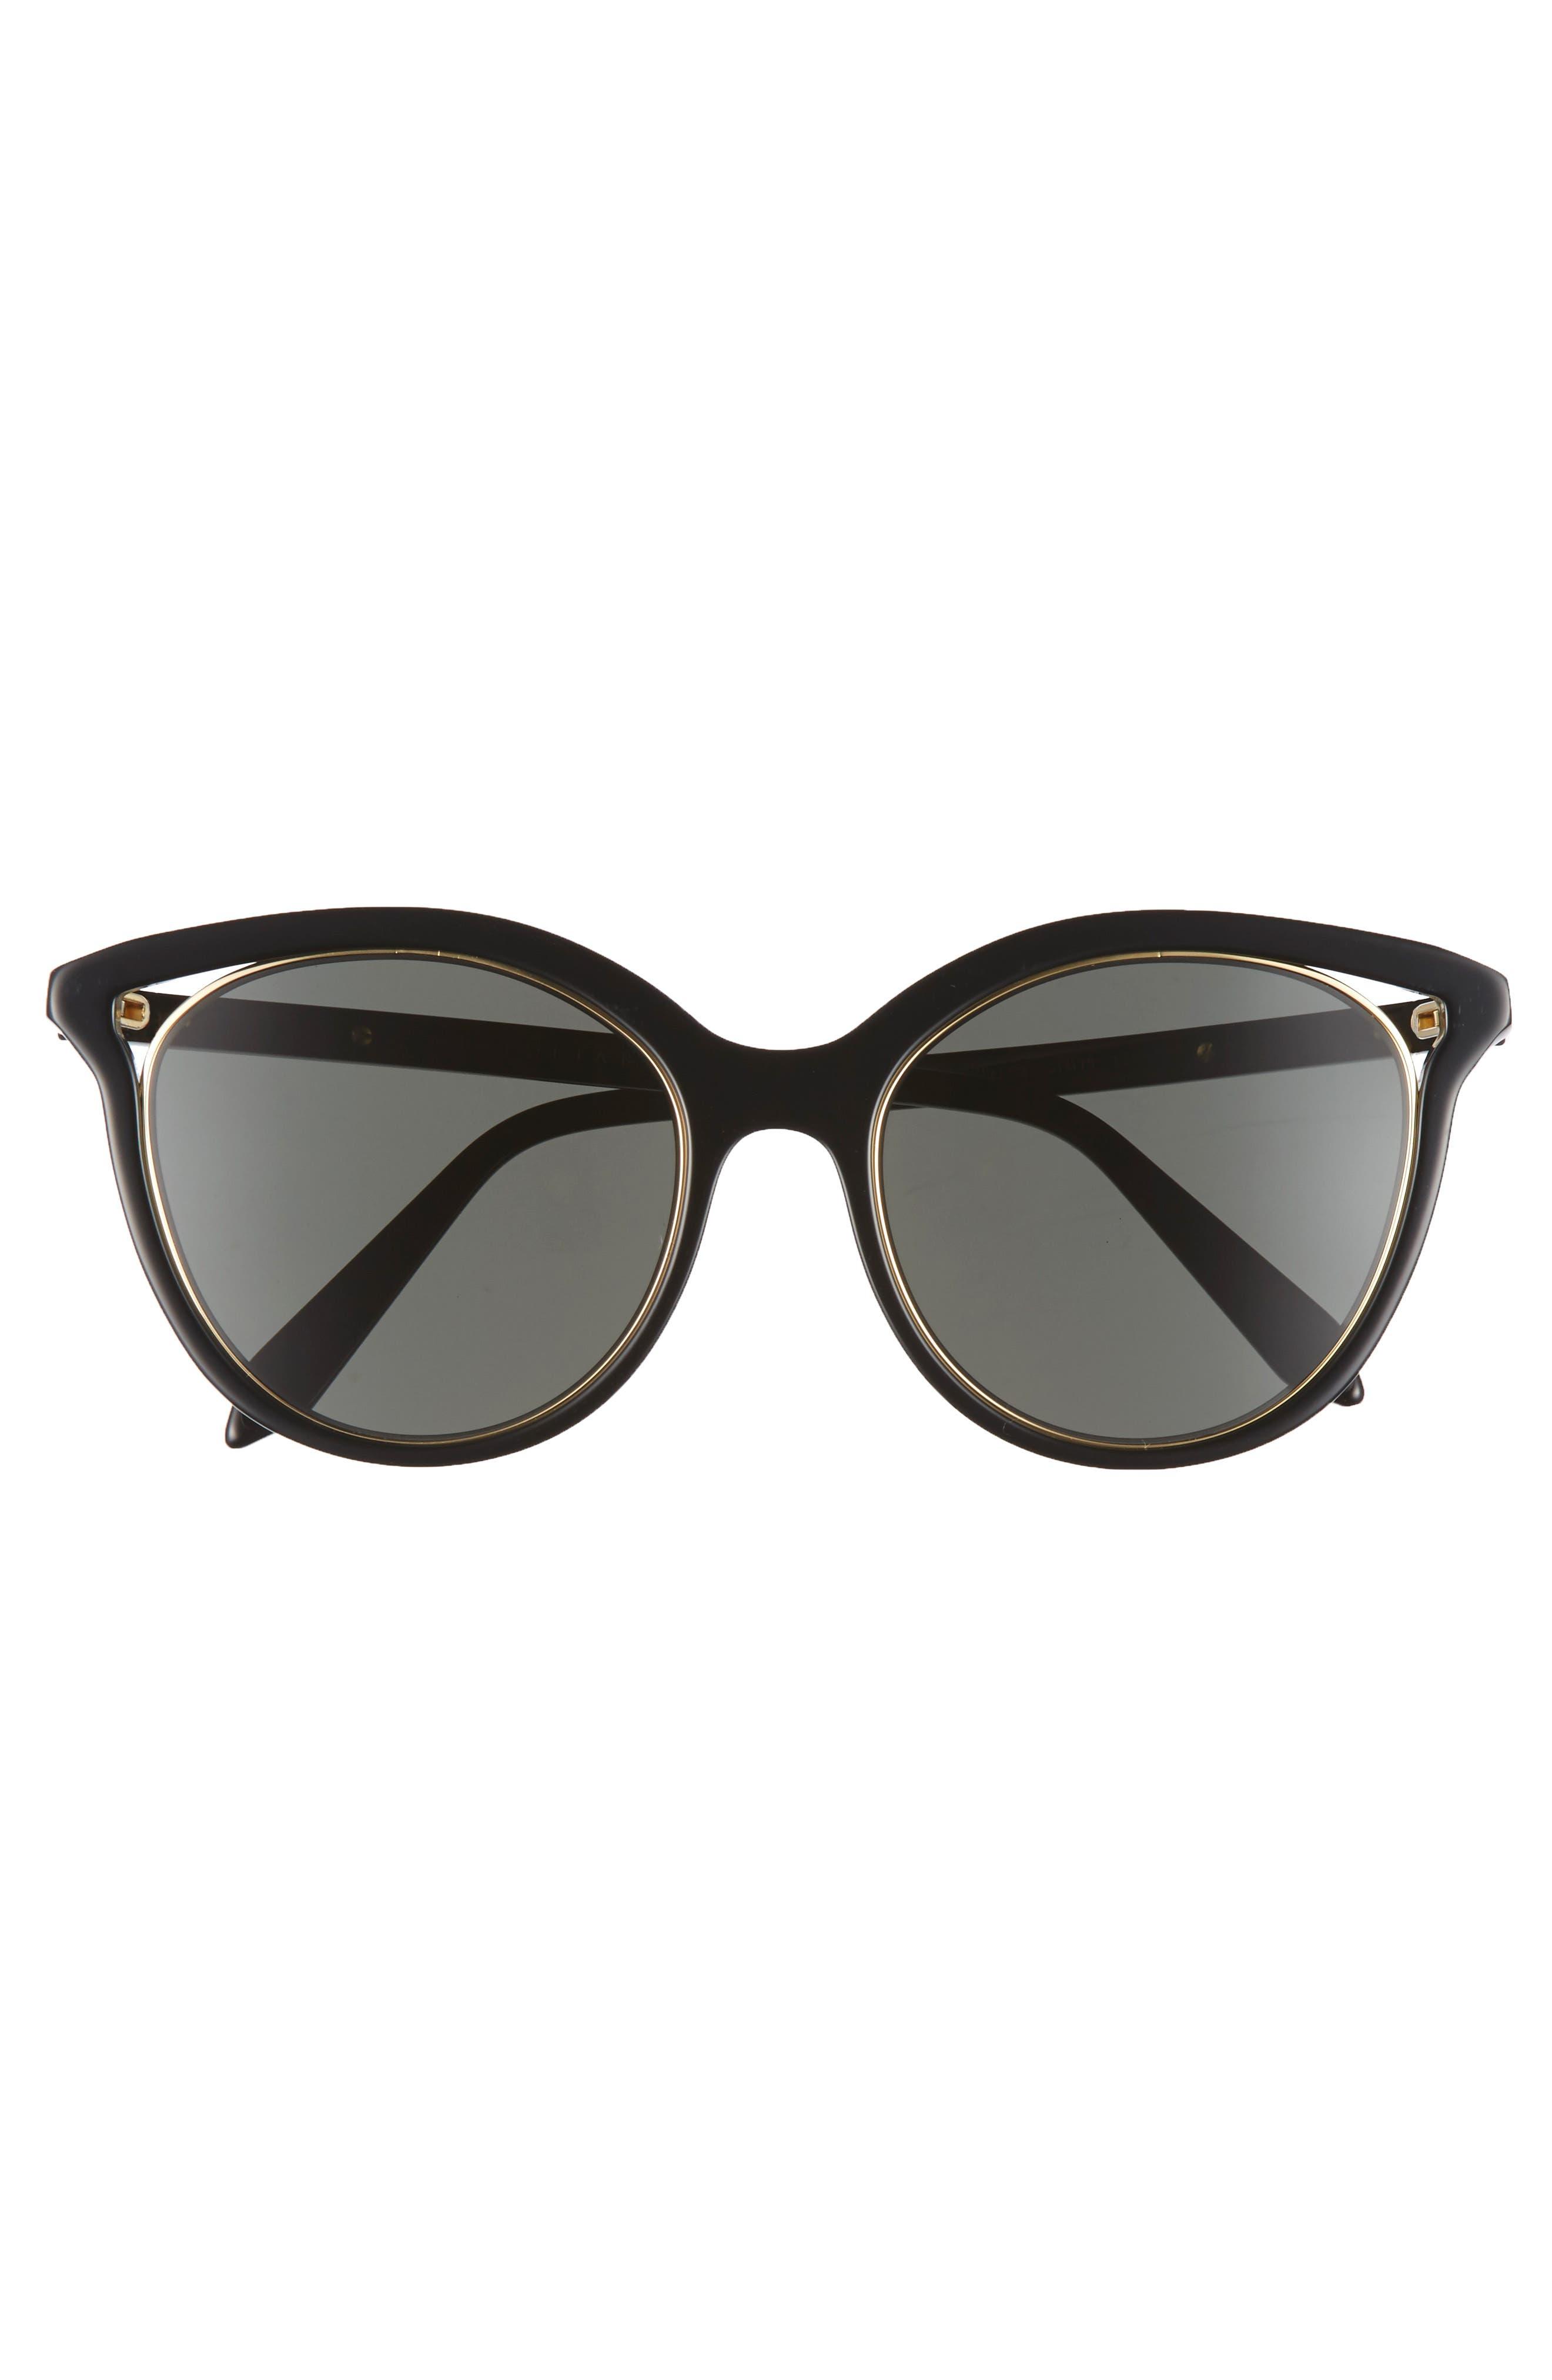 VICTORIA BECKHAM, Cutaway Kitten 54mm Cat Eye Sunglasses, Alternate thumbnail 3, color, BLACK/ GOLD